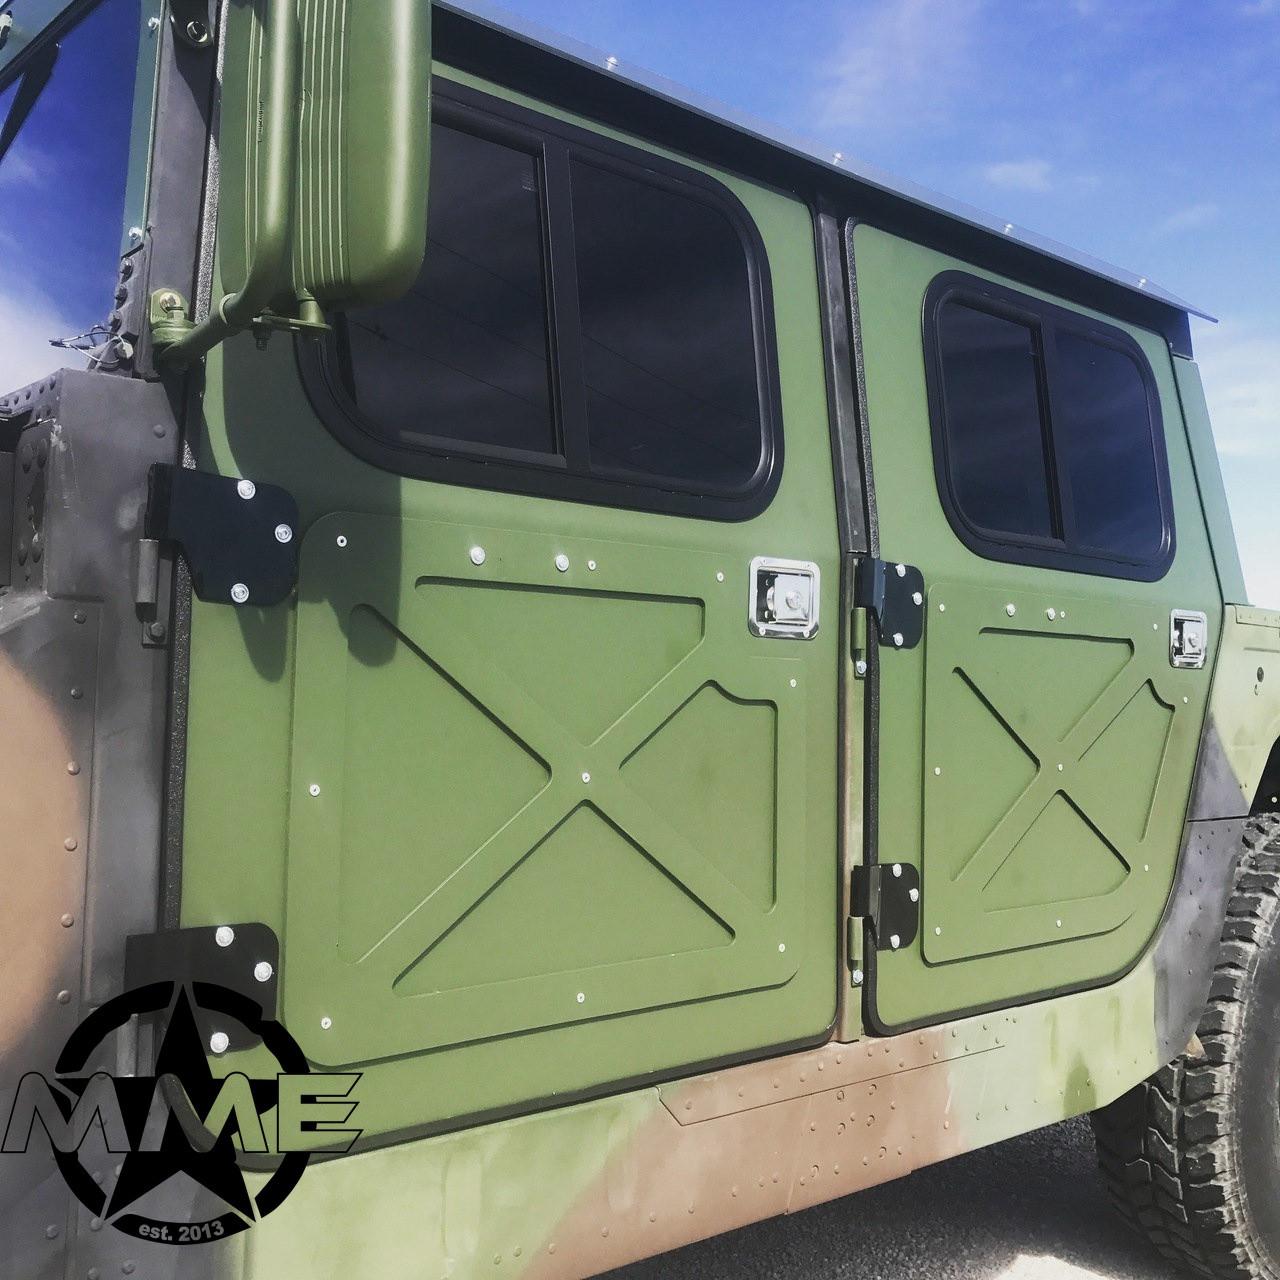 NEW Hummer H1 Military 998 Humvee Hmmwv Aluminum Hard Door Kit (set of 4) & NEW Hummer H1 Military 998 Humvee Hmmwv Aluminum Hard Door Kit (set ...